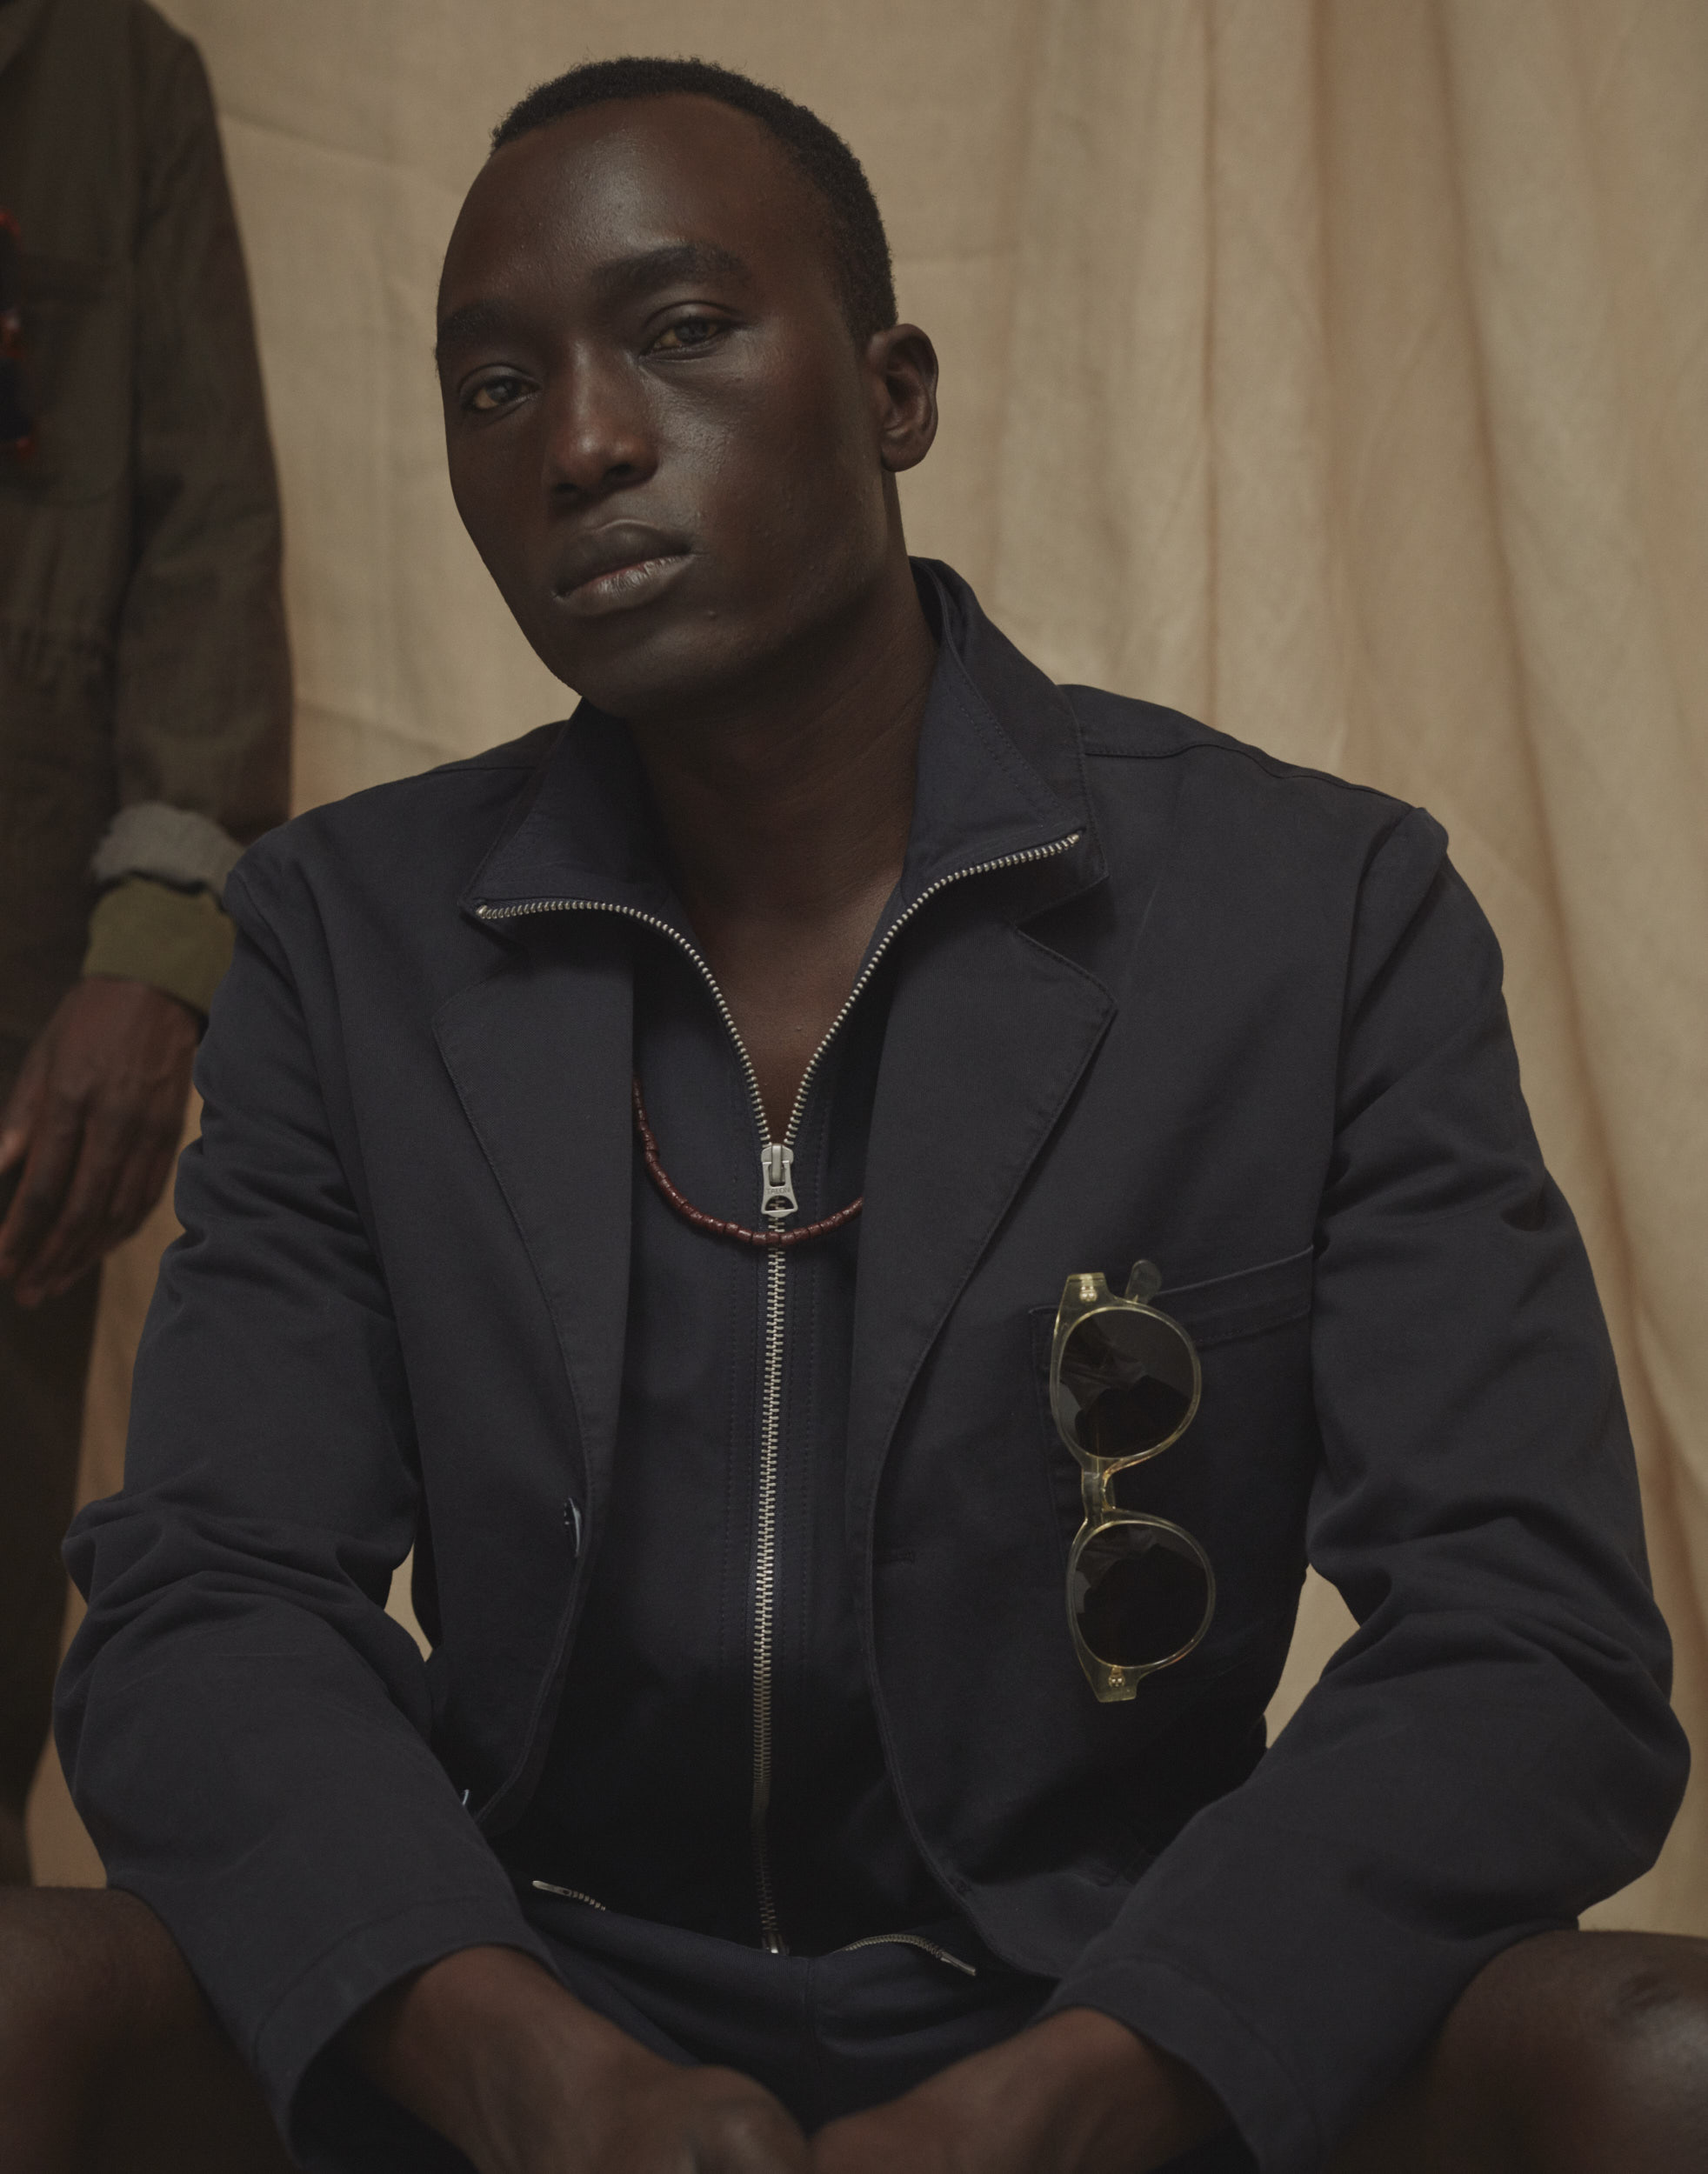 ymc-ss17-collection-okoro-men-fashion-folkr-4